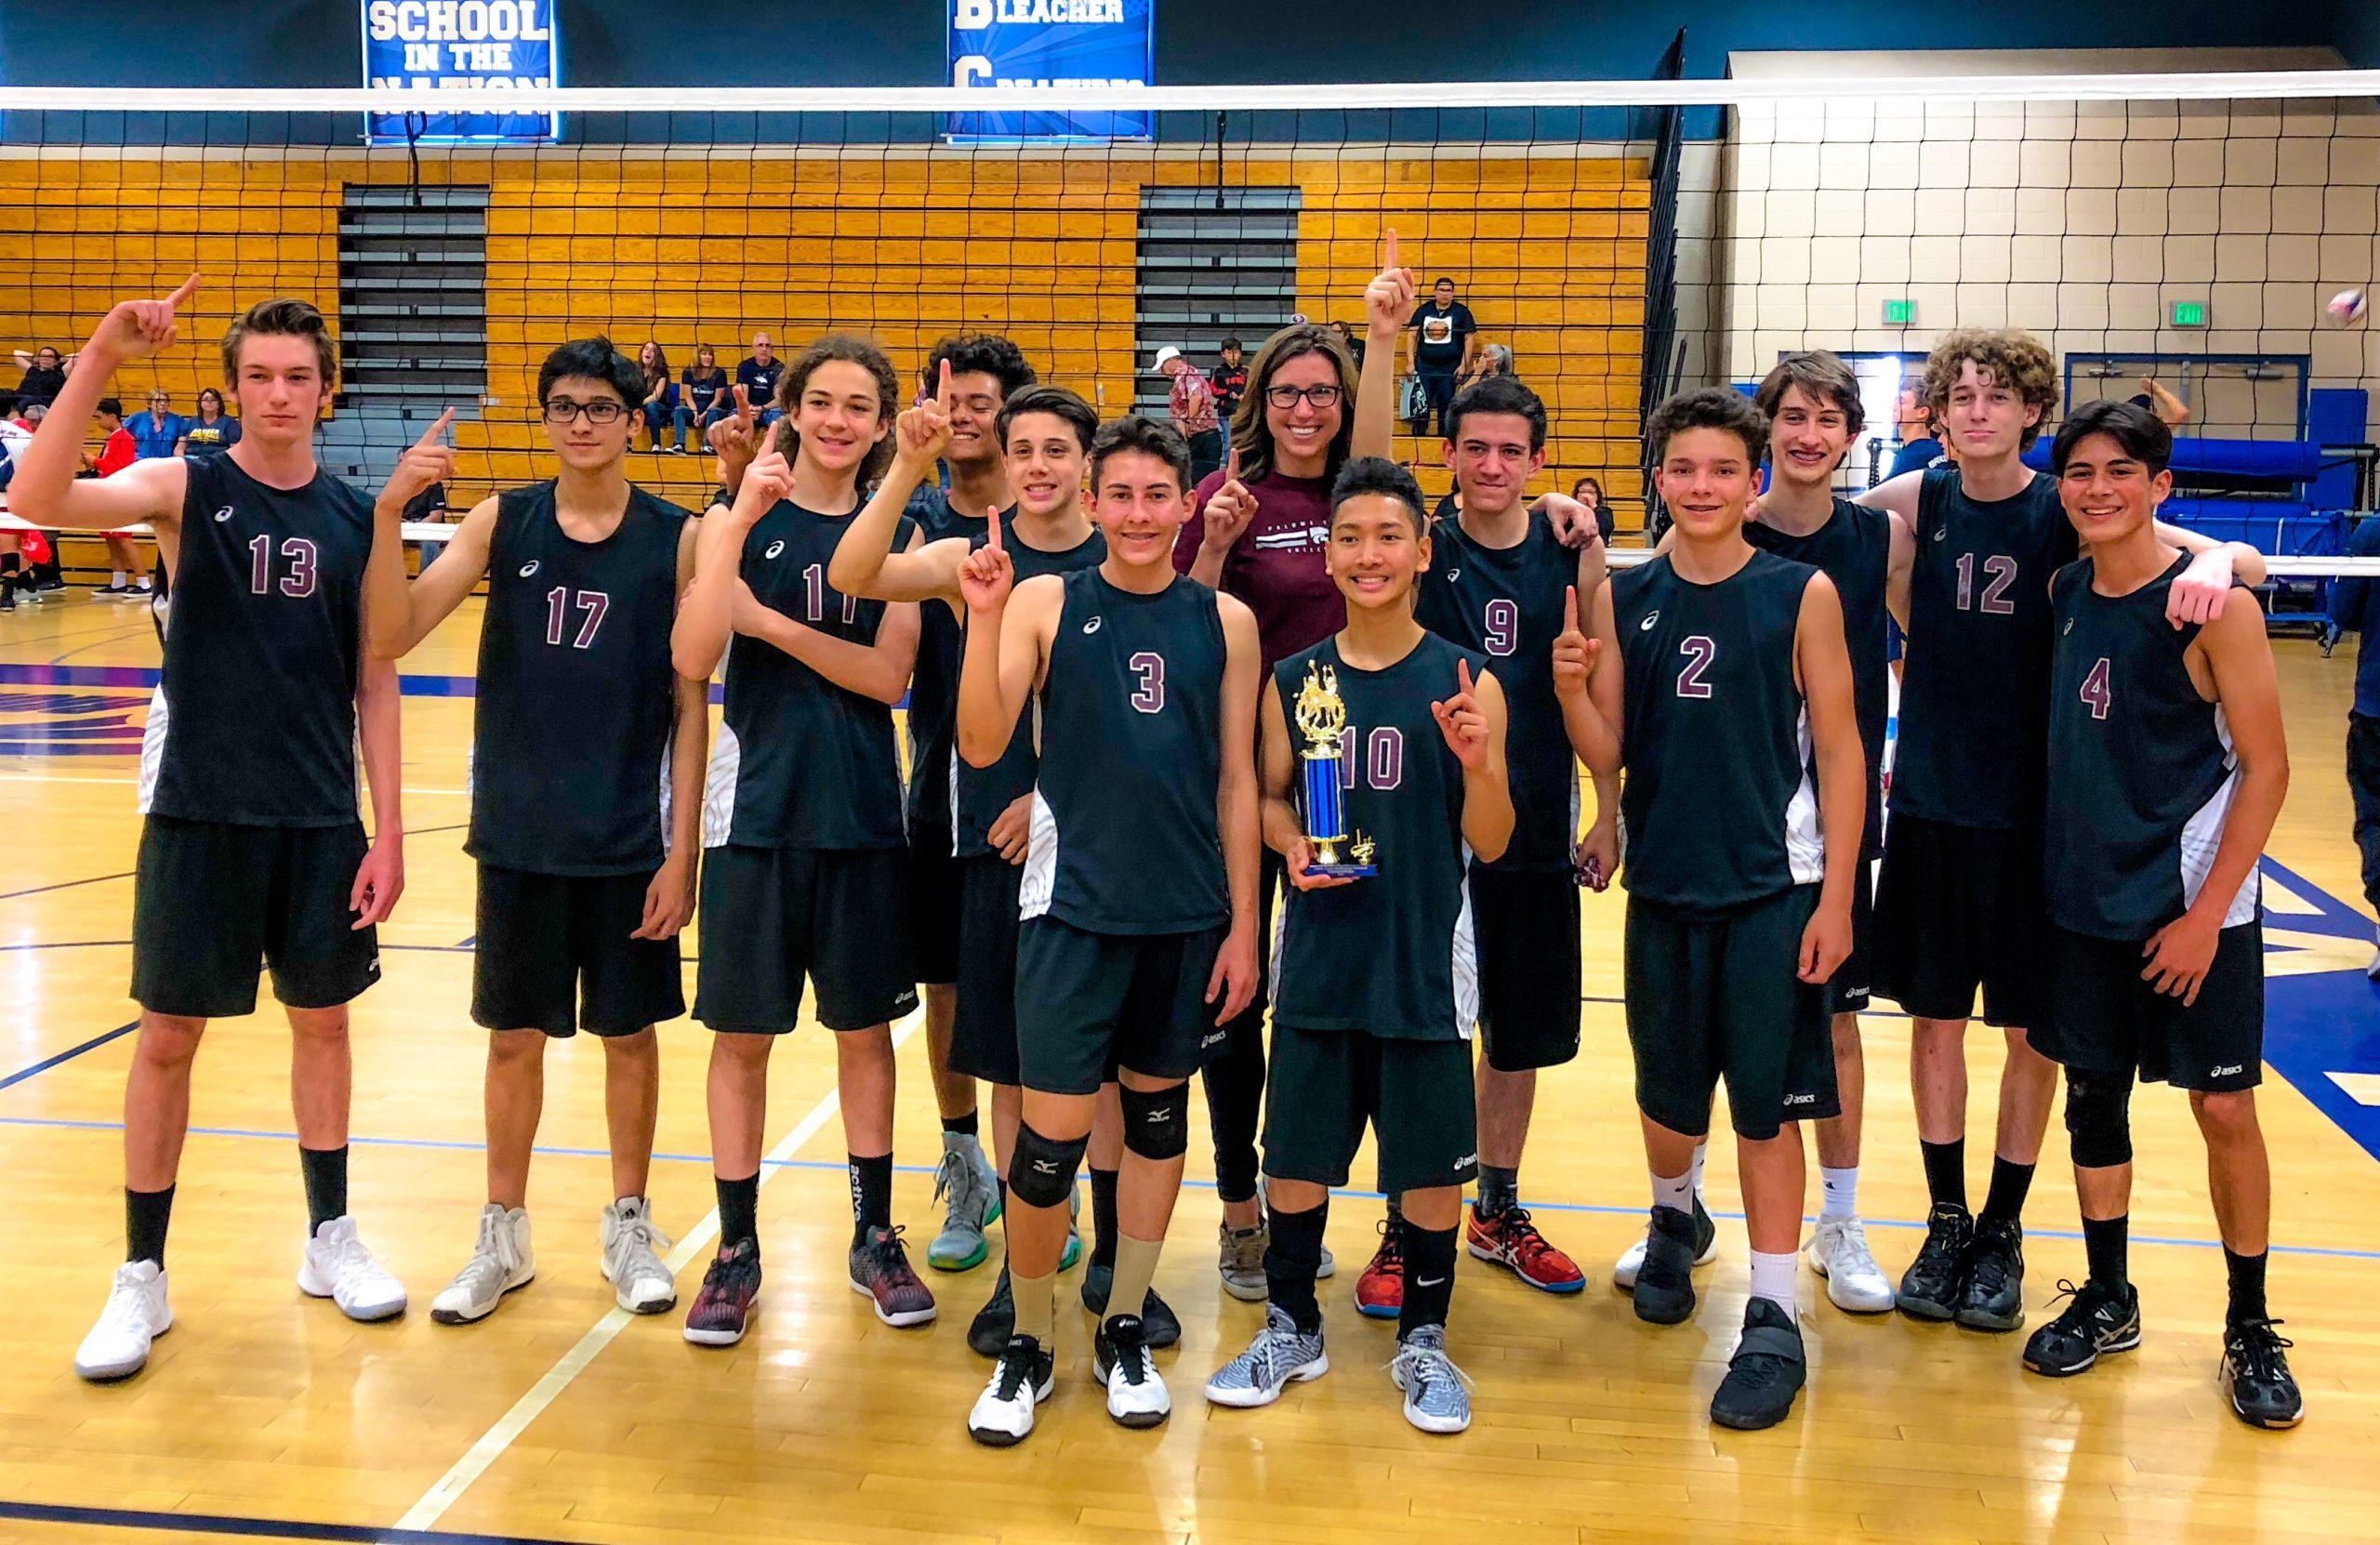 Paloma Valley - Team Home Paloma Valley Wildcats Sports Inside Paloma Valley High School Menifee Holidays